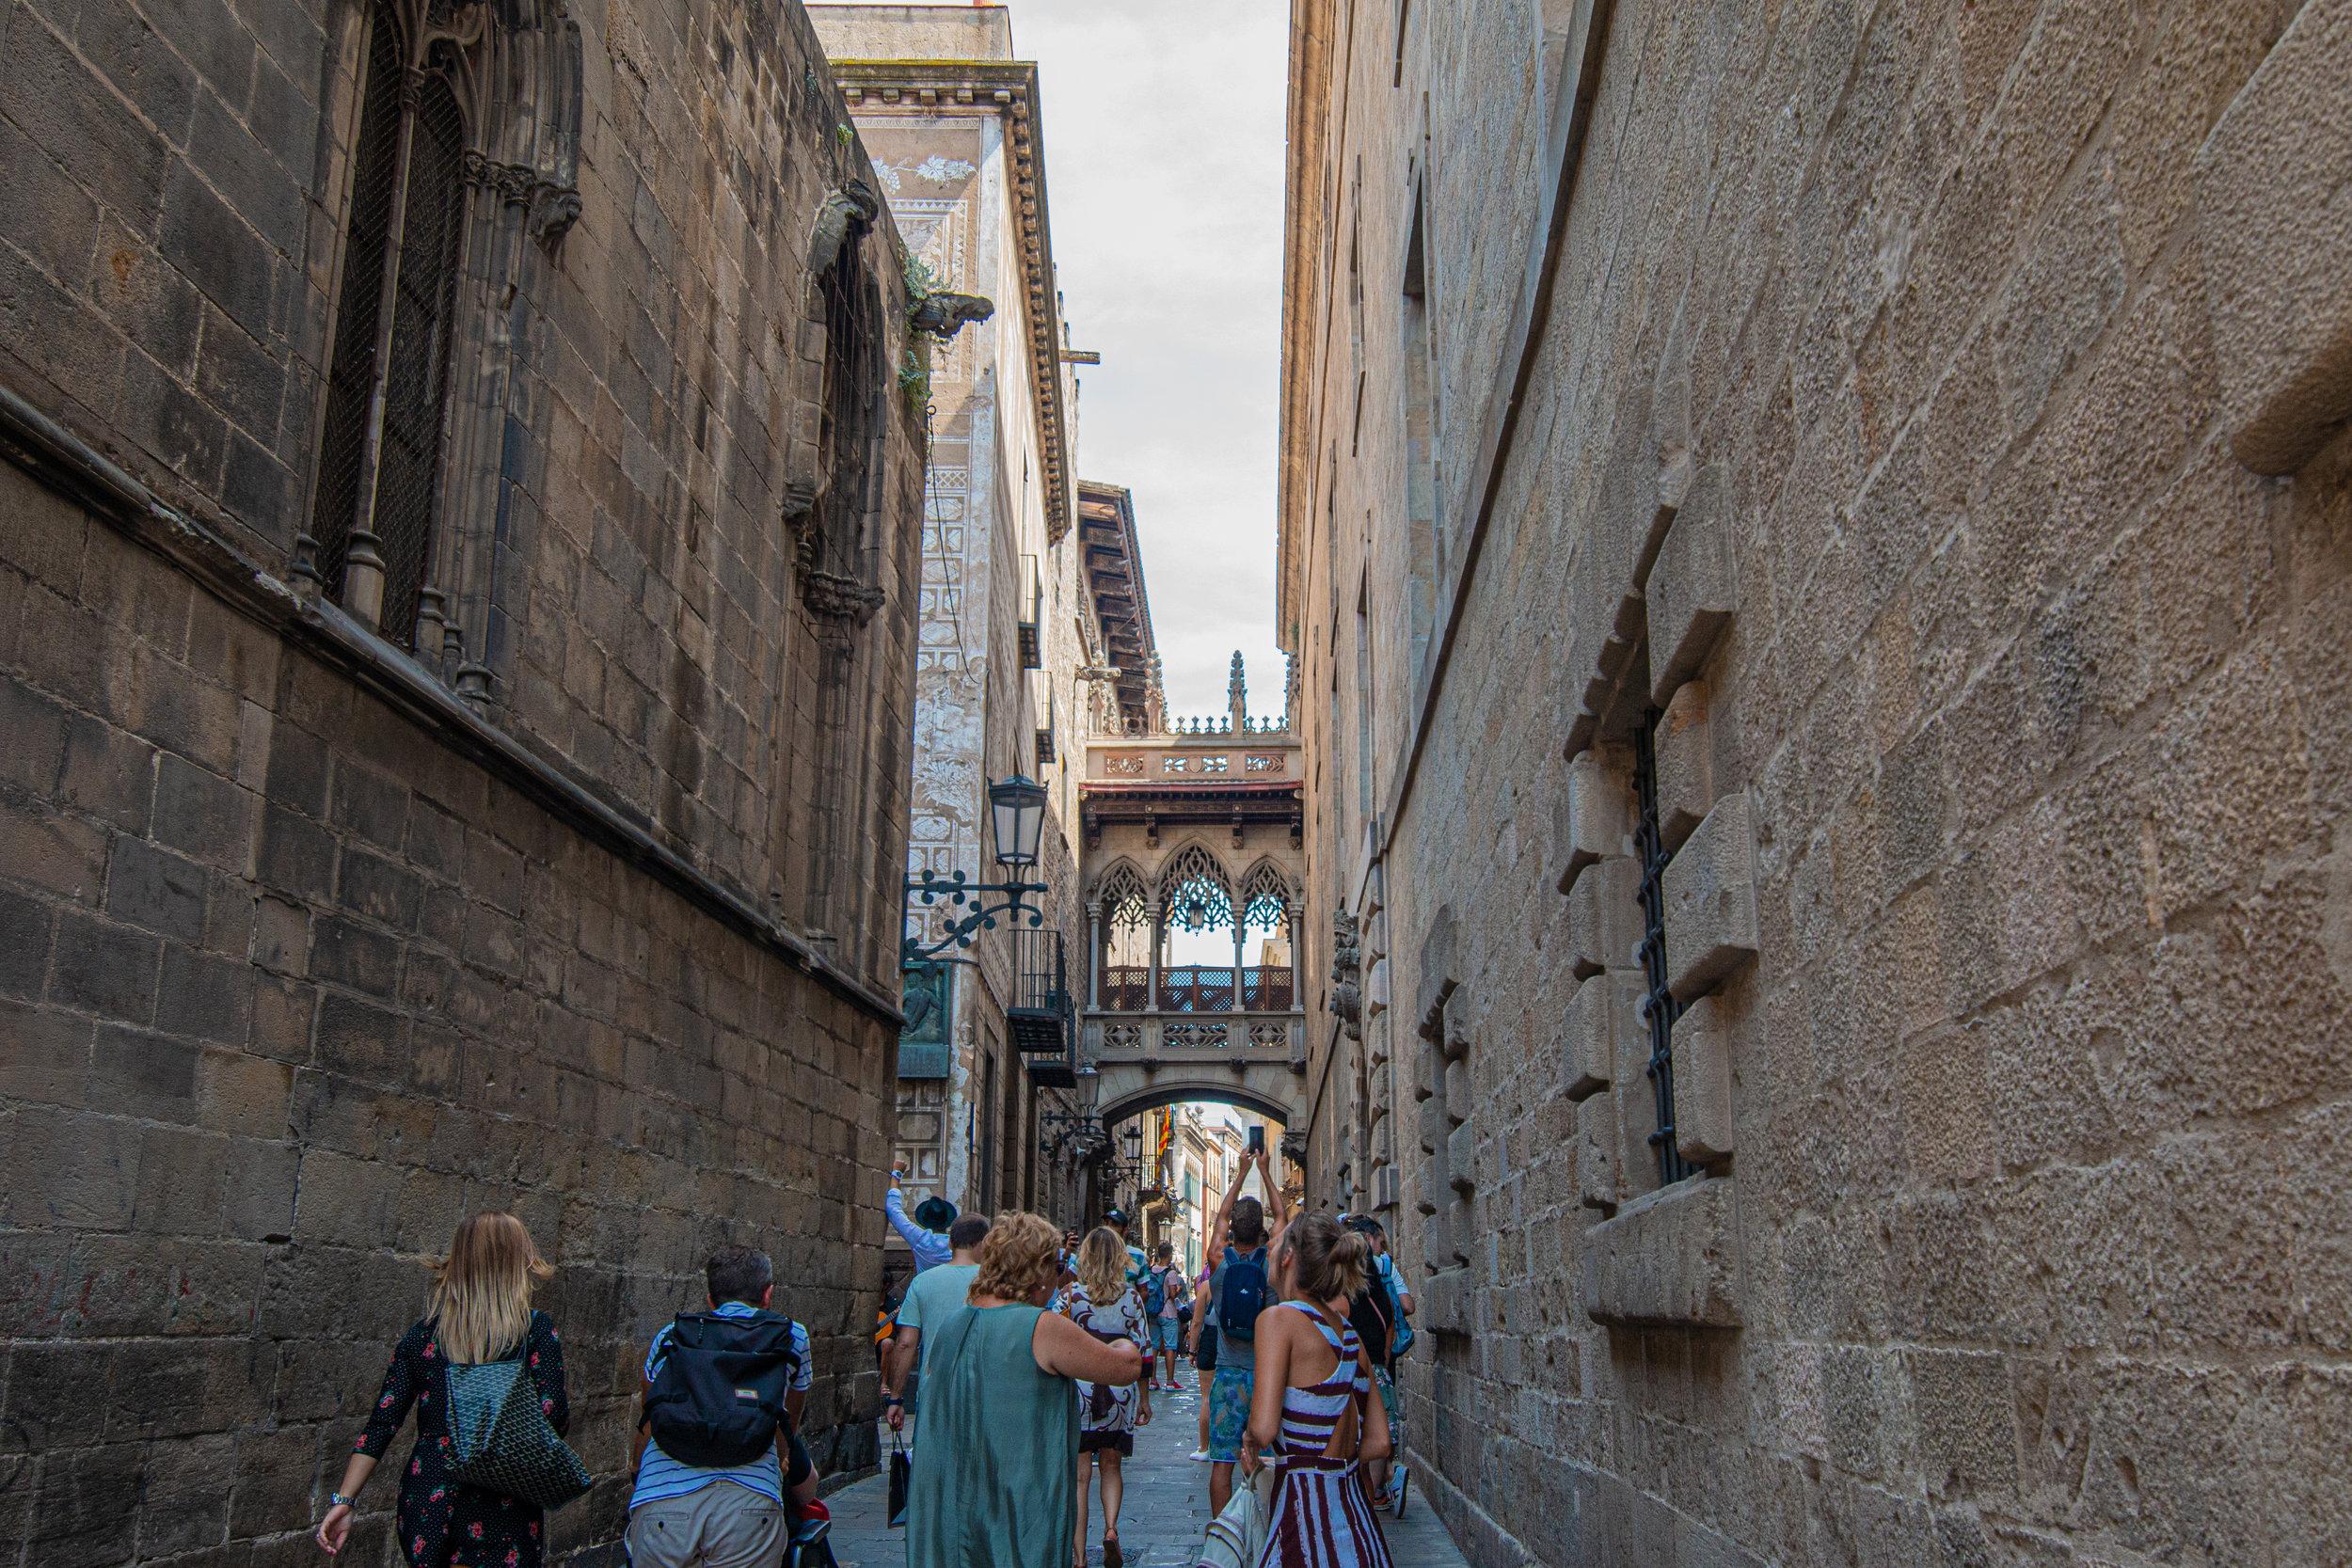 Barcelona-Gotico-6.jpg